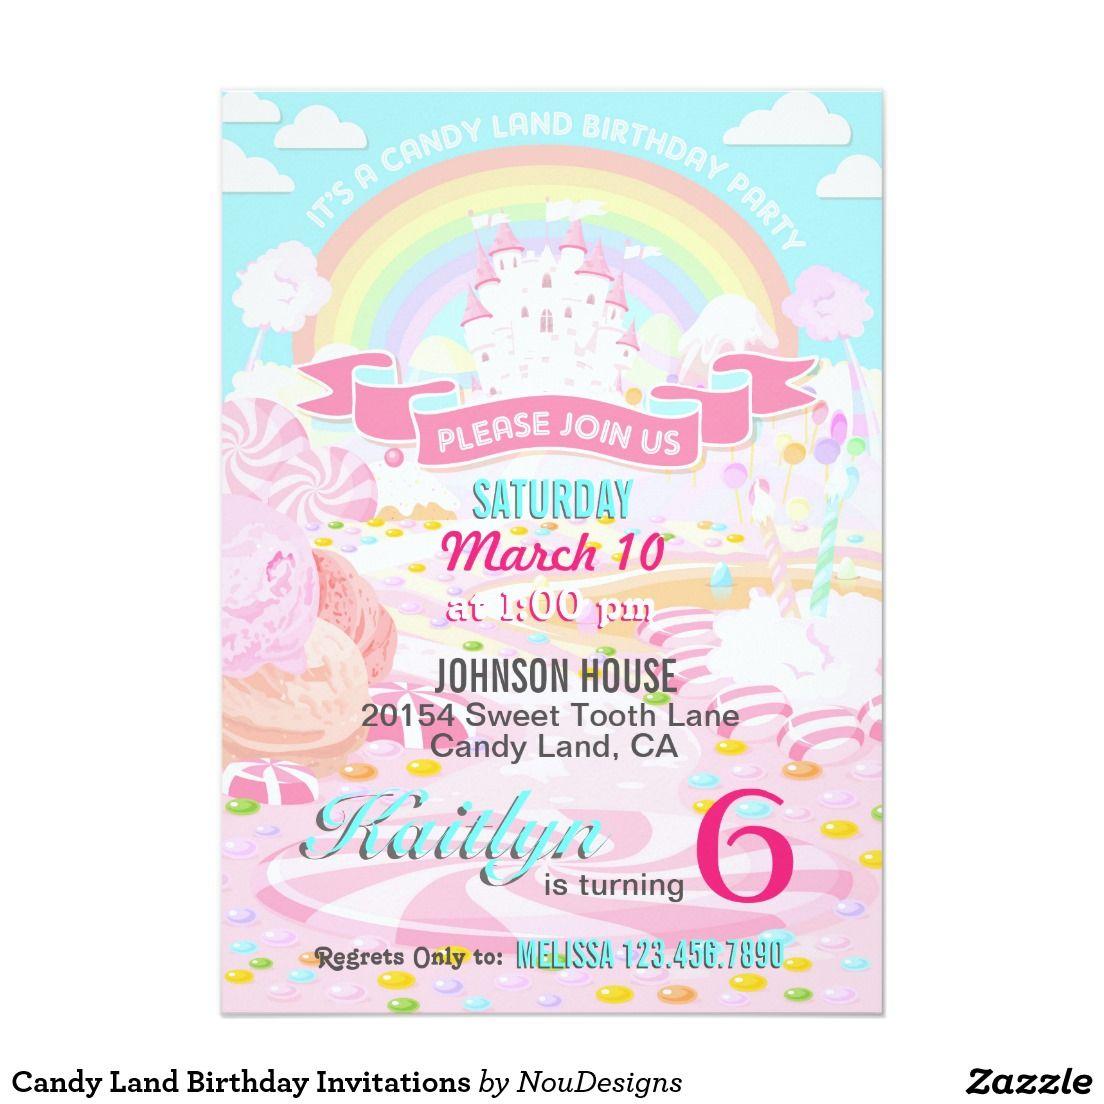 Candy land birthday invitations candy land birthday candy land birthday invitations stopboris Images